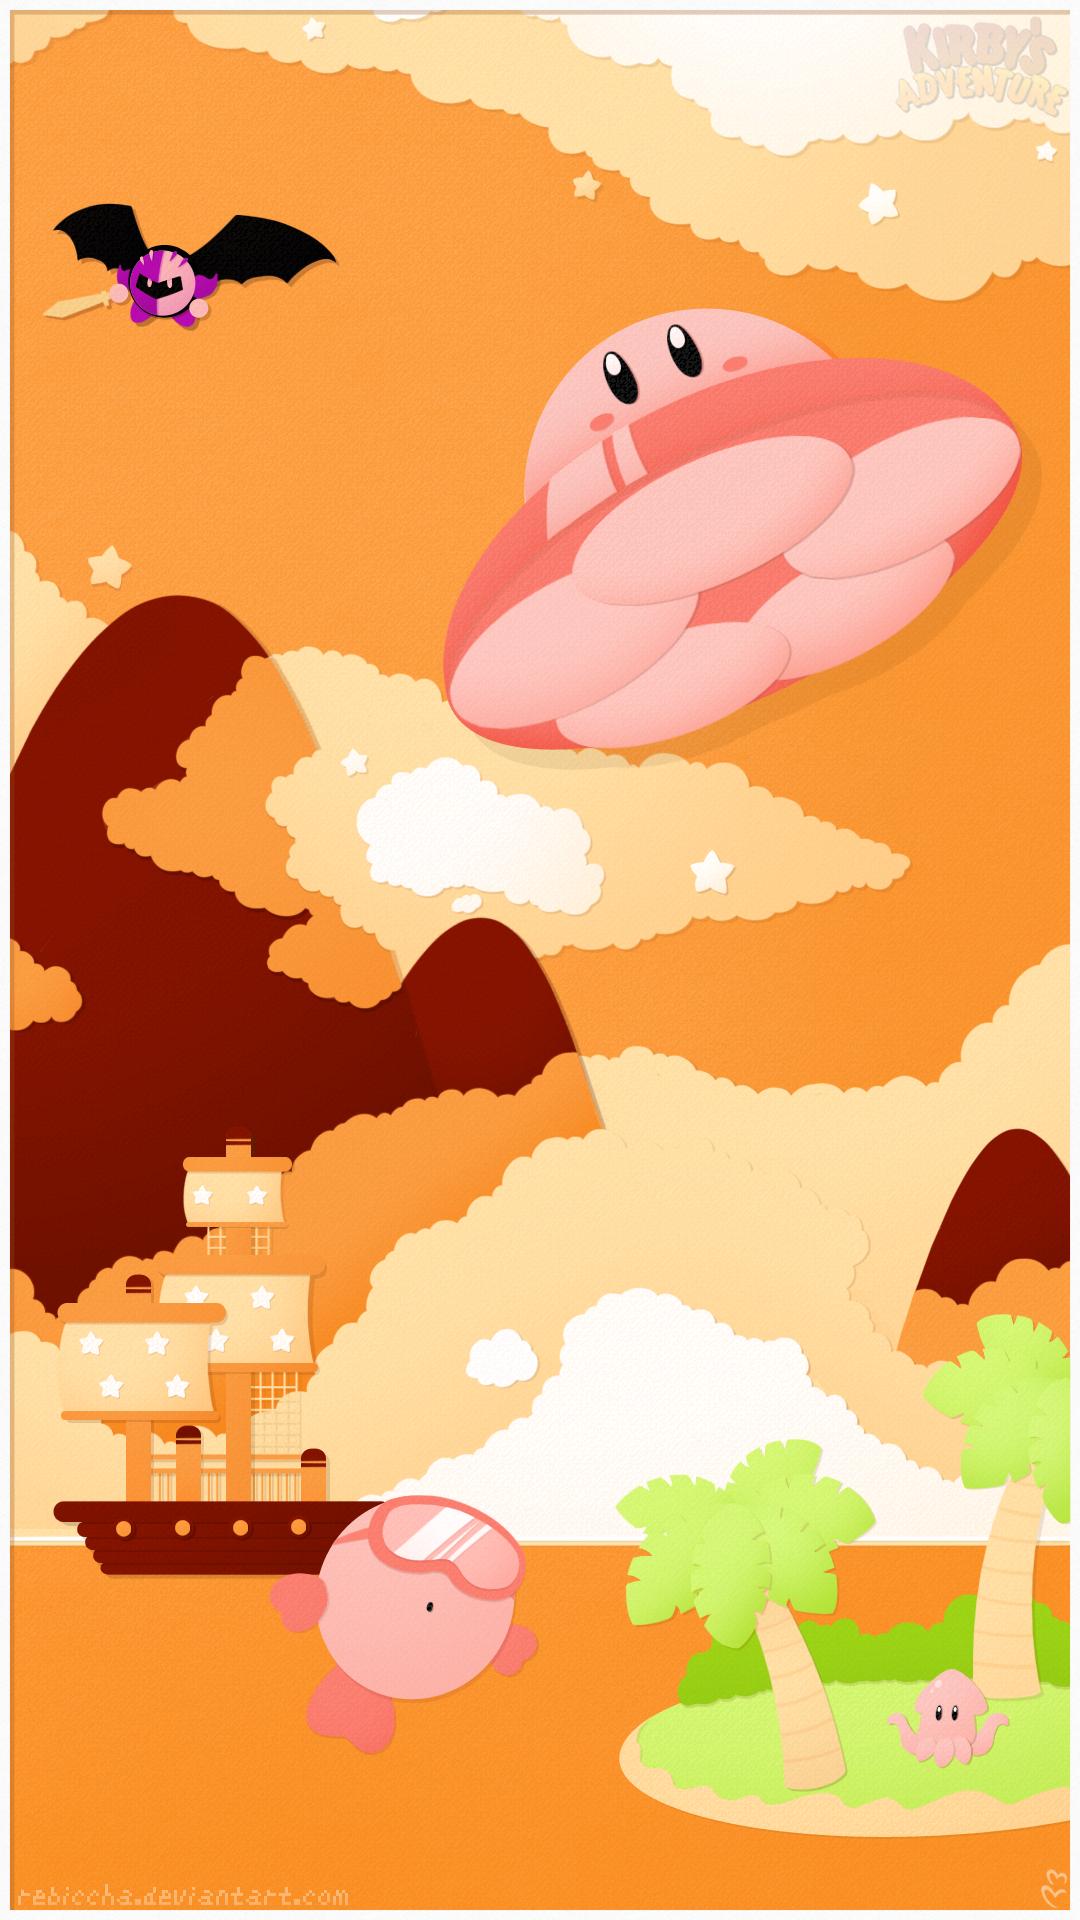 The Skies of Dream Land: Orange Ocean by Riiao